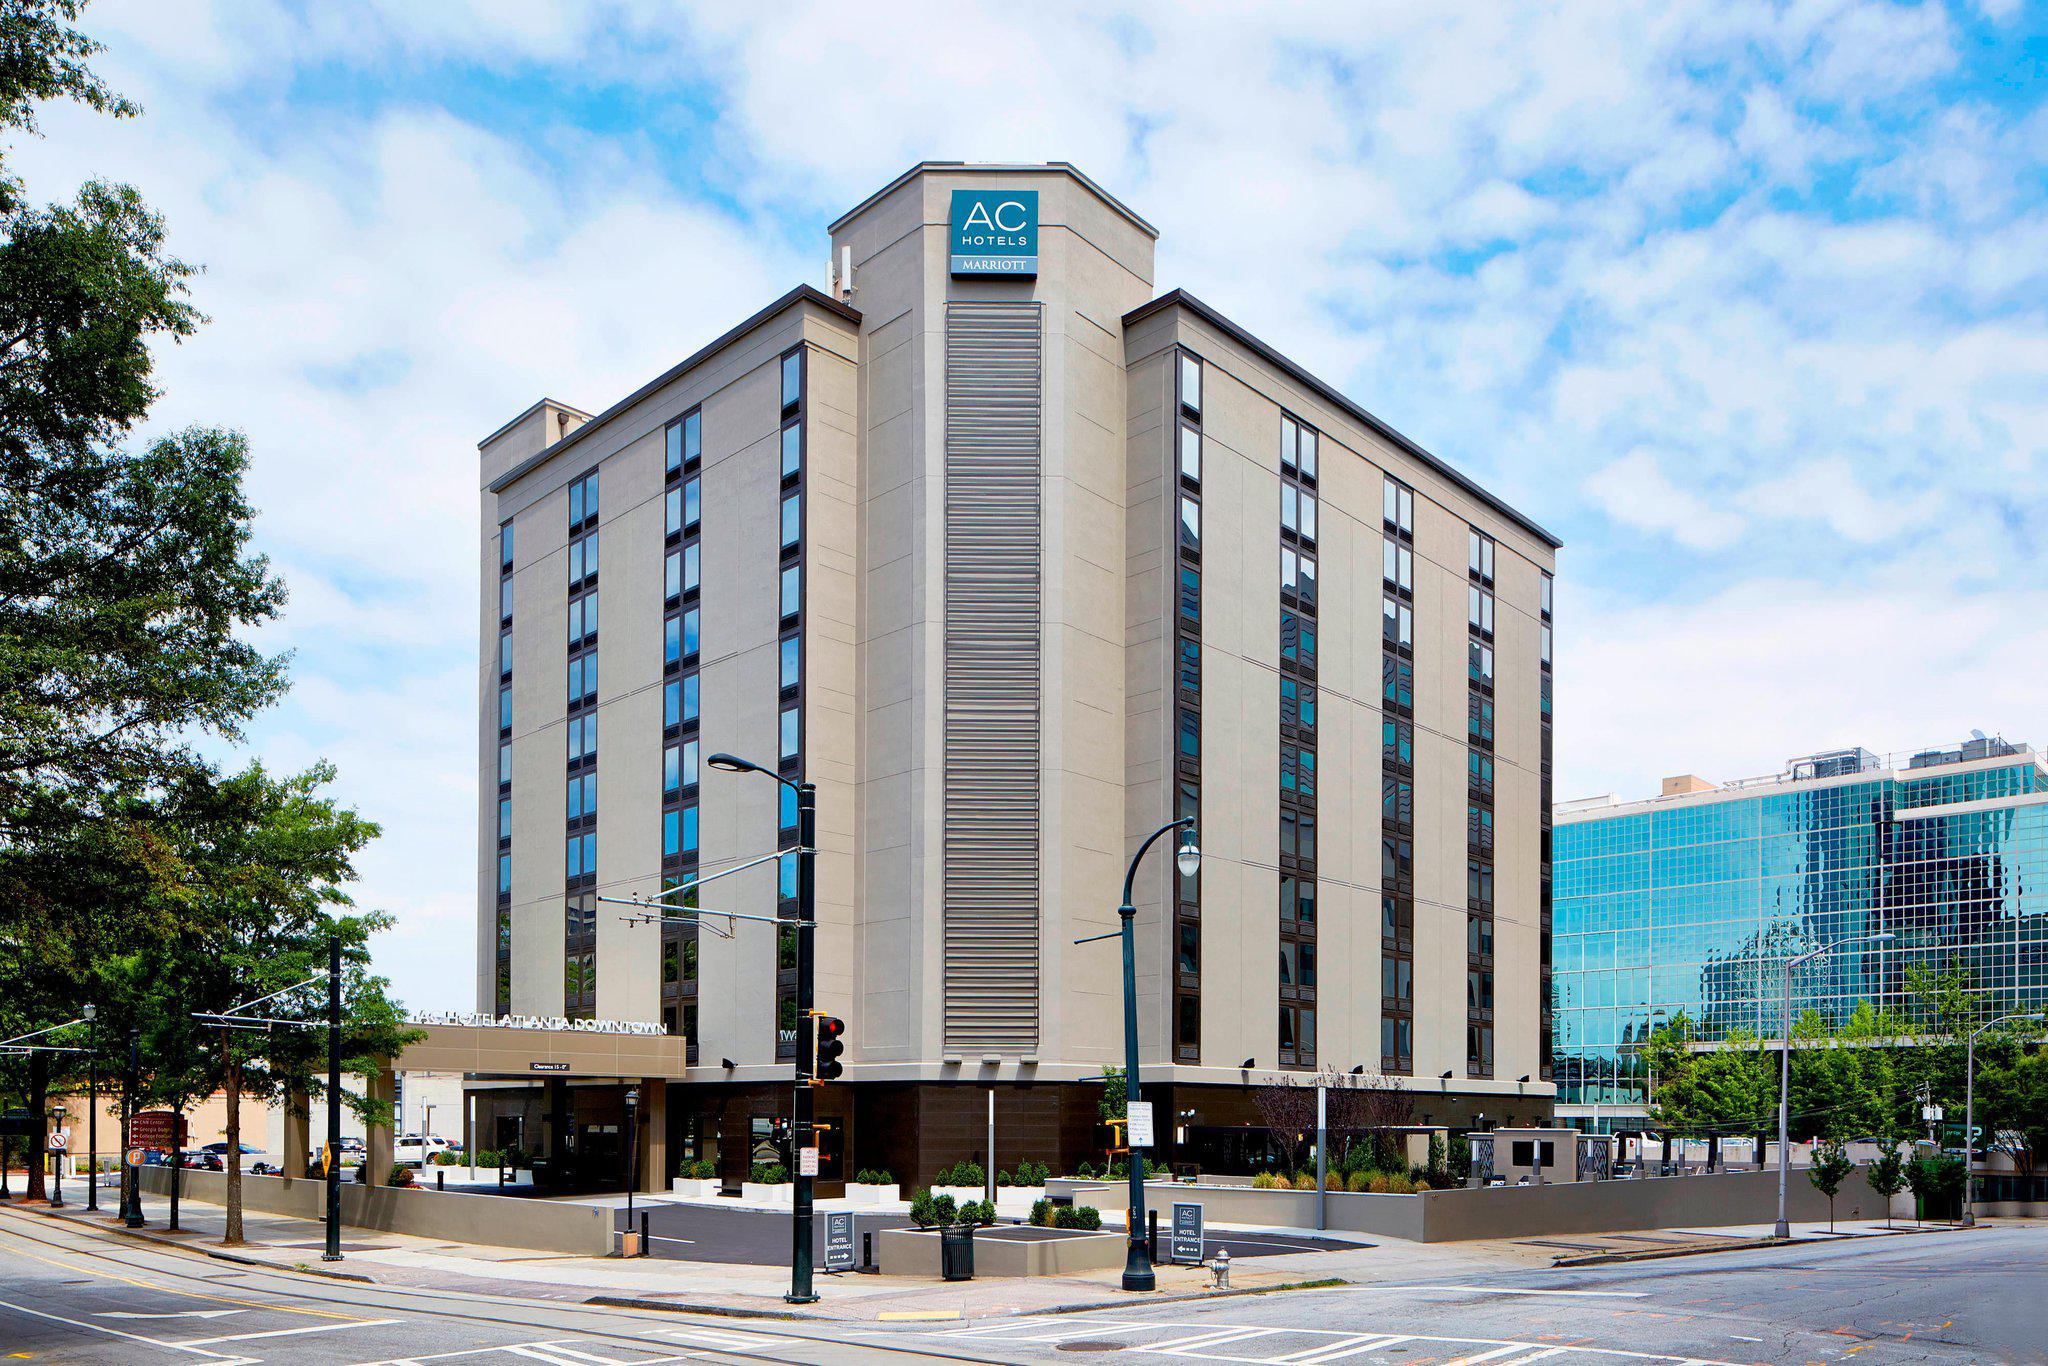 AC Hotel by Marriott Atlanta Downtown